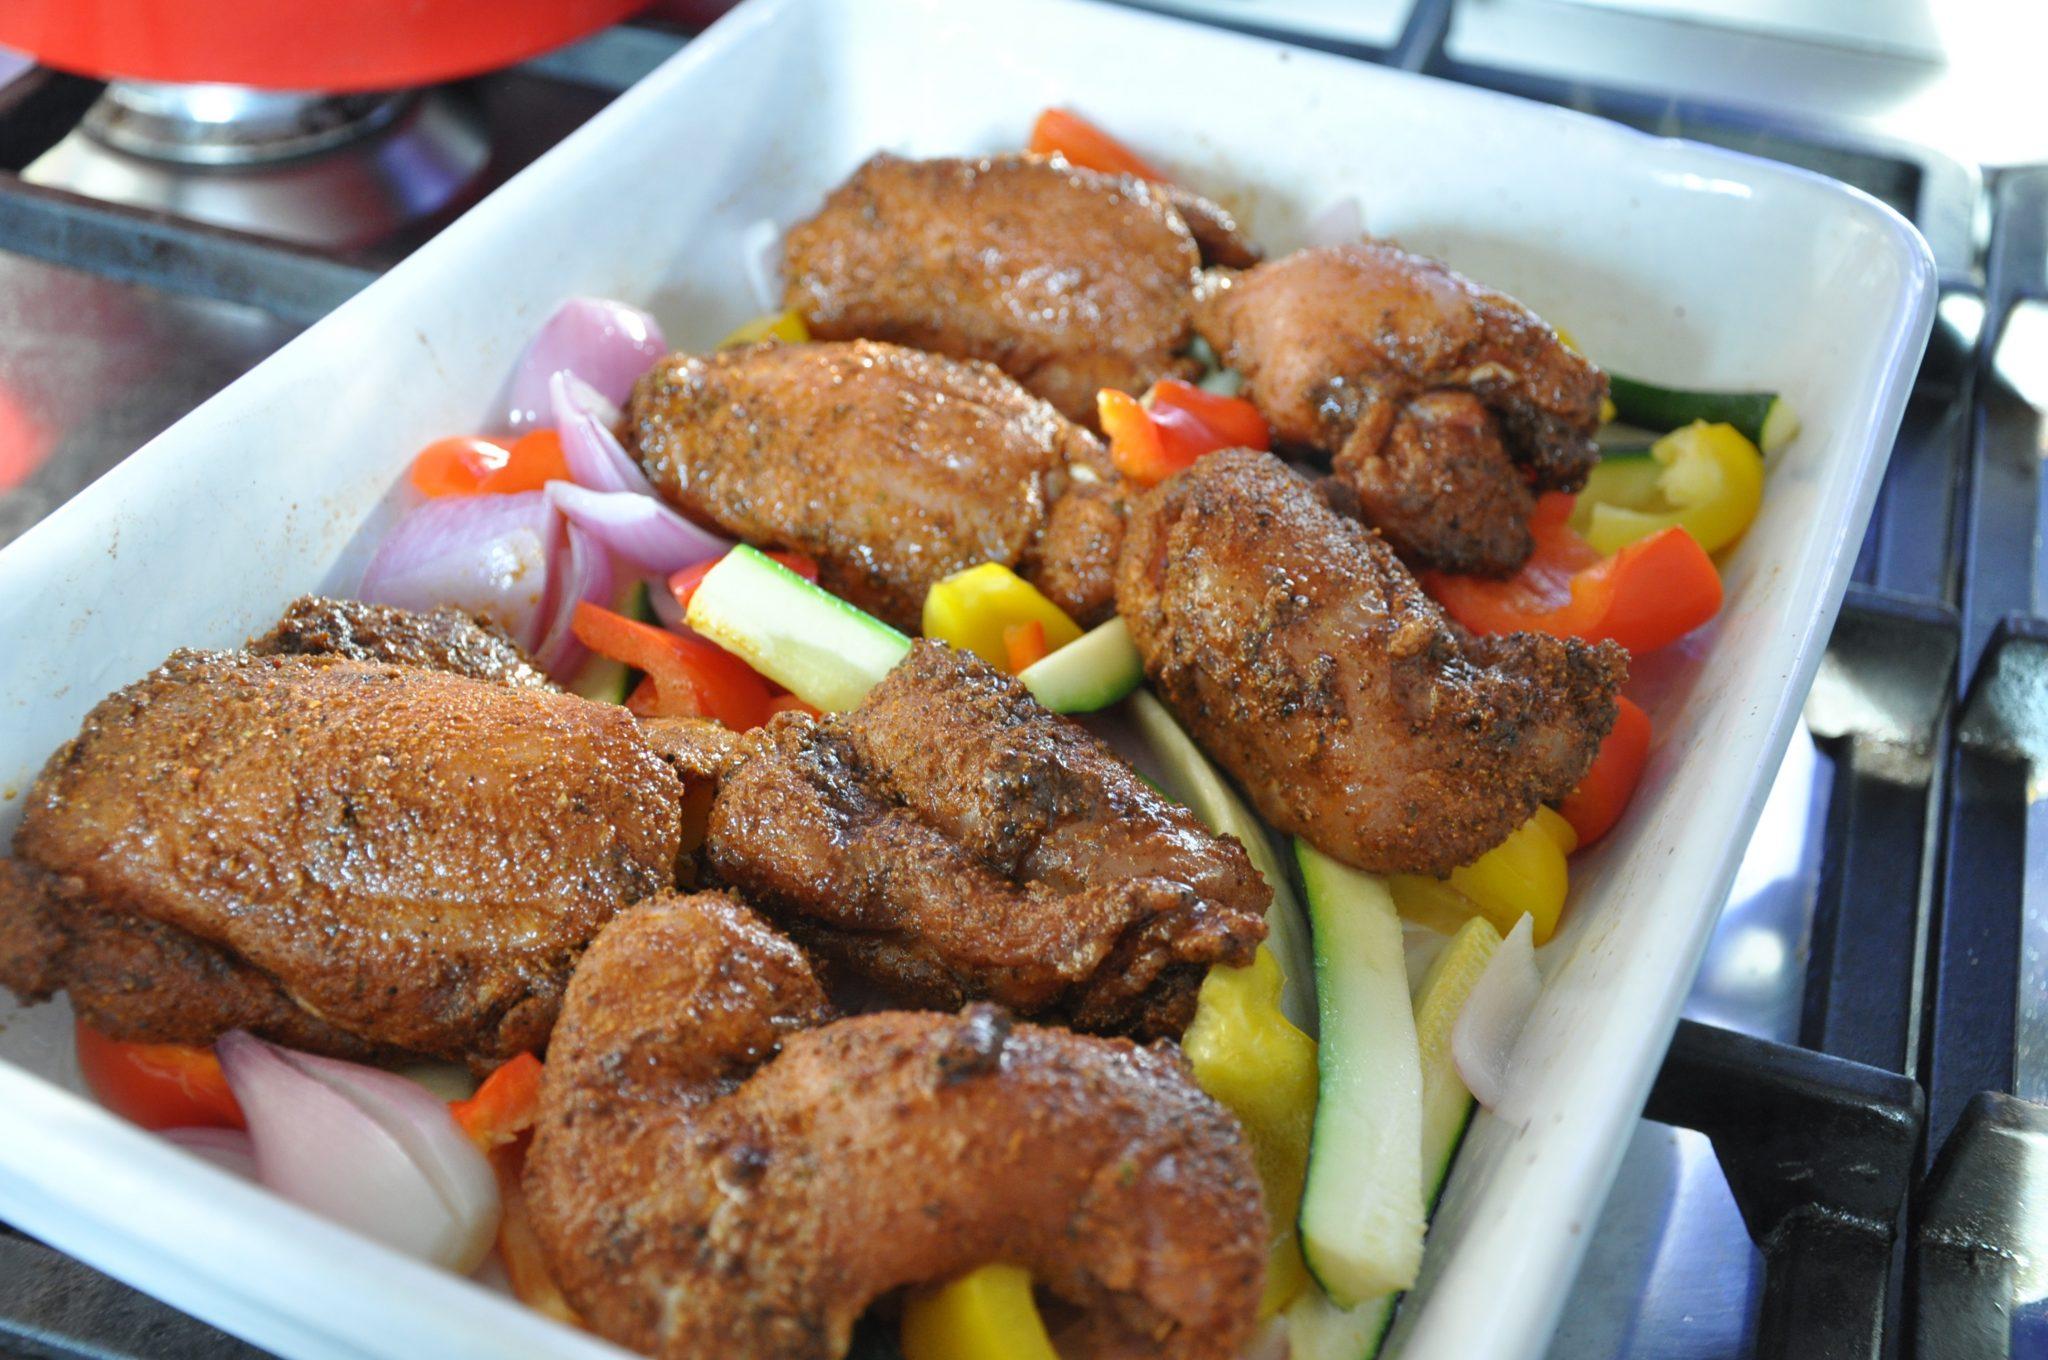 Easy jerk chicken recipe 3jerk chickencaribbean food weekmiss pond 2jerk chickencaribbean food weekmiss pond forumfinder Images